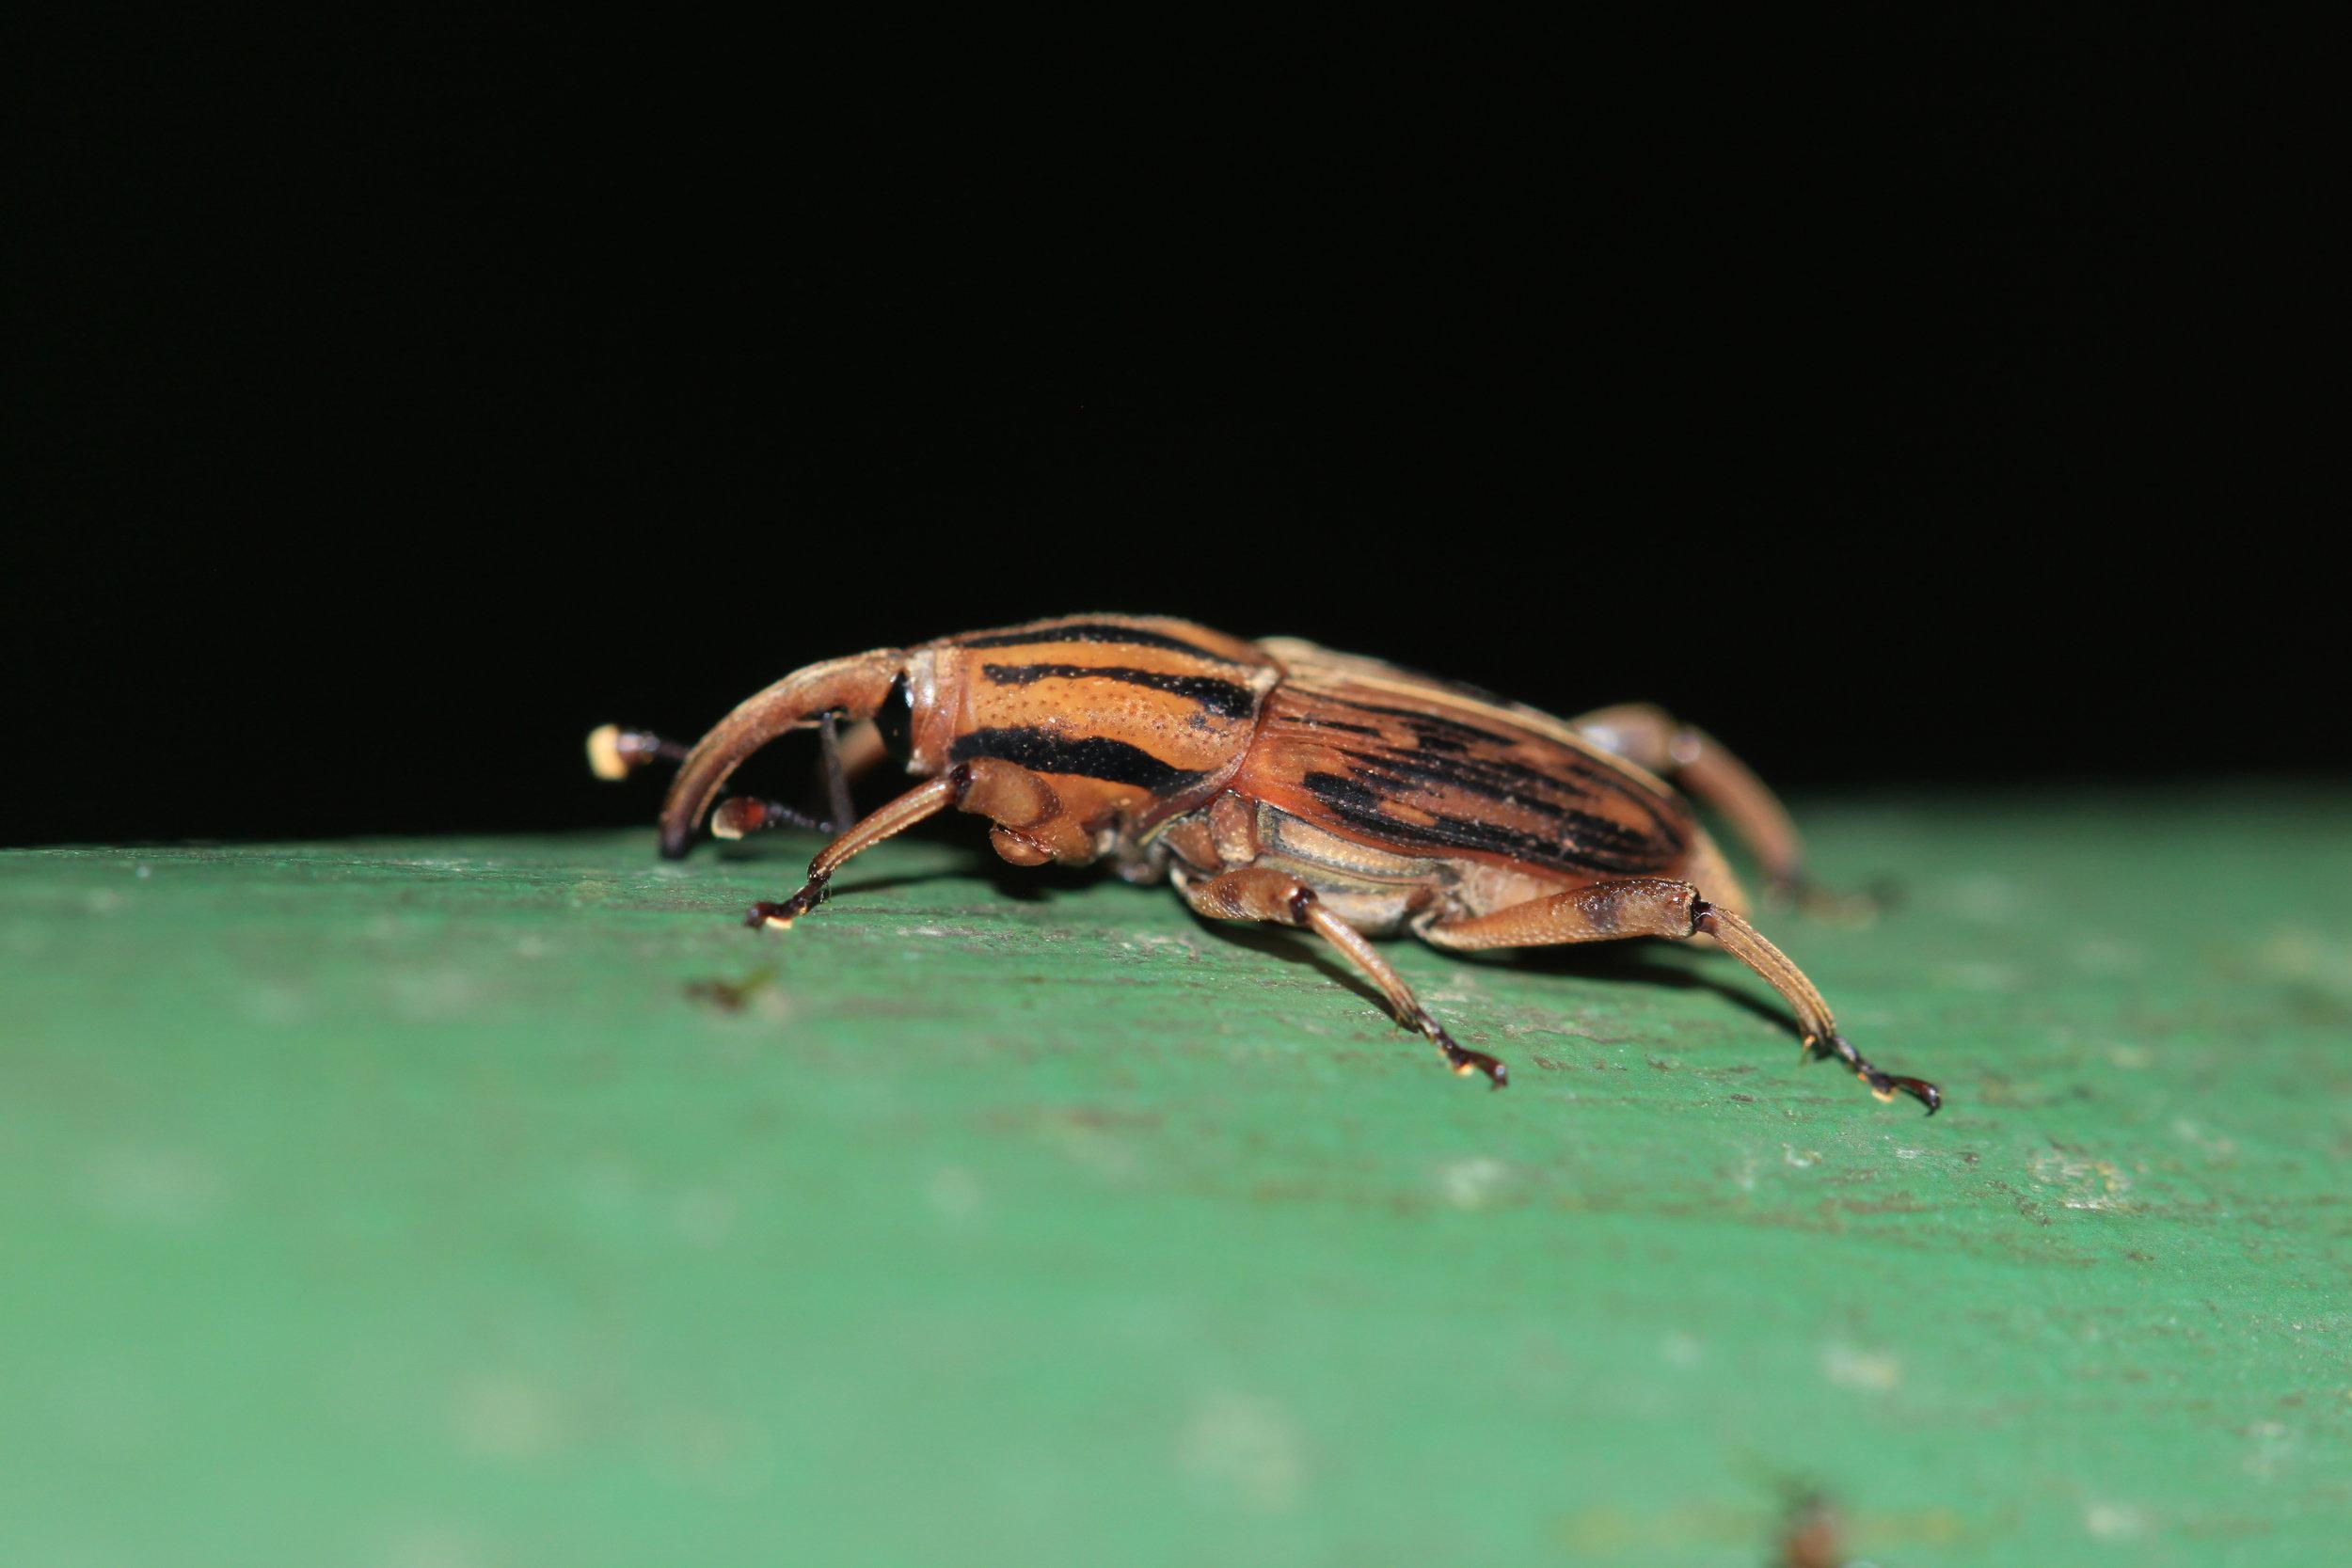 Weevil at night Costa Rica.